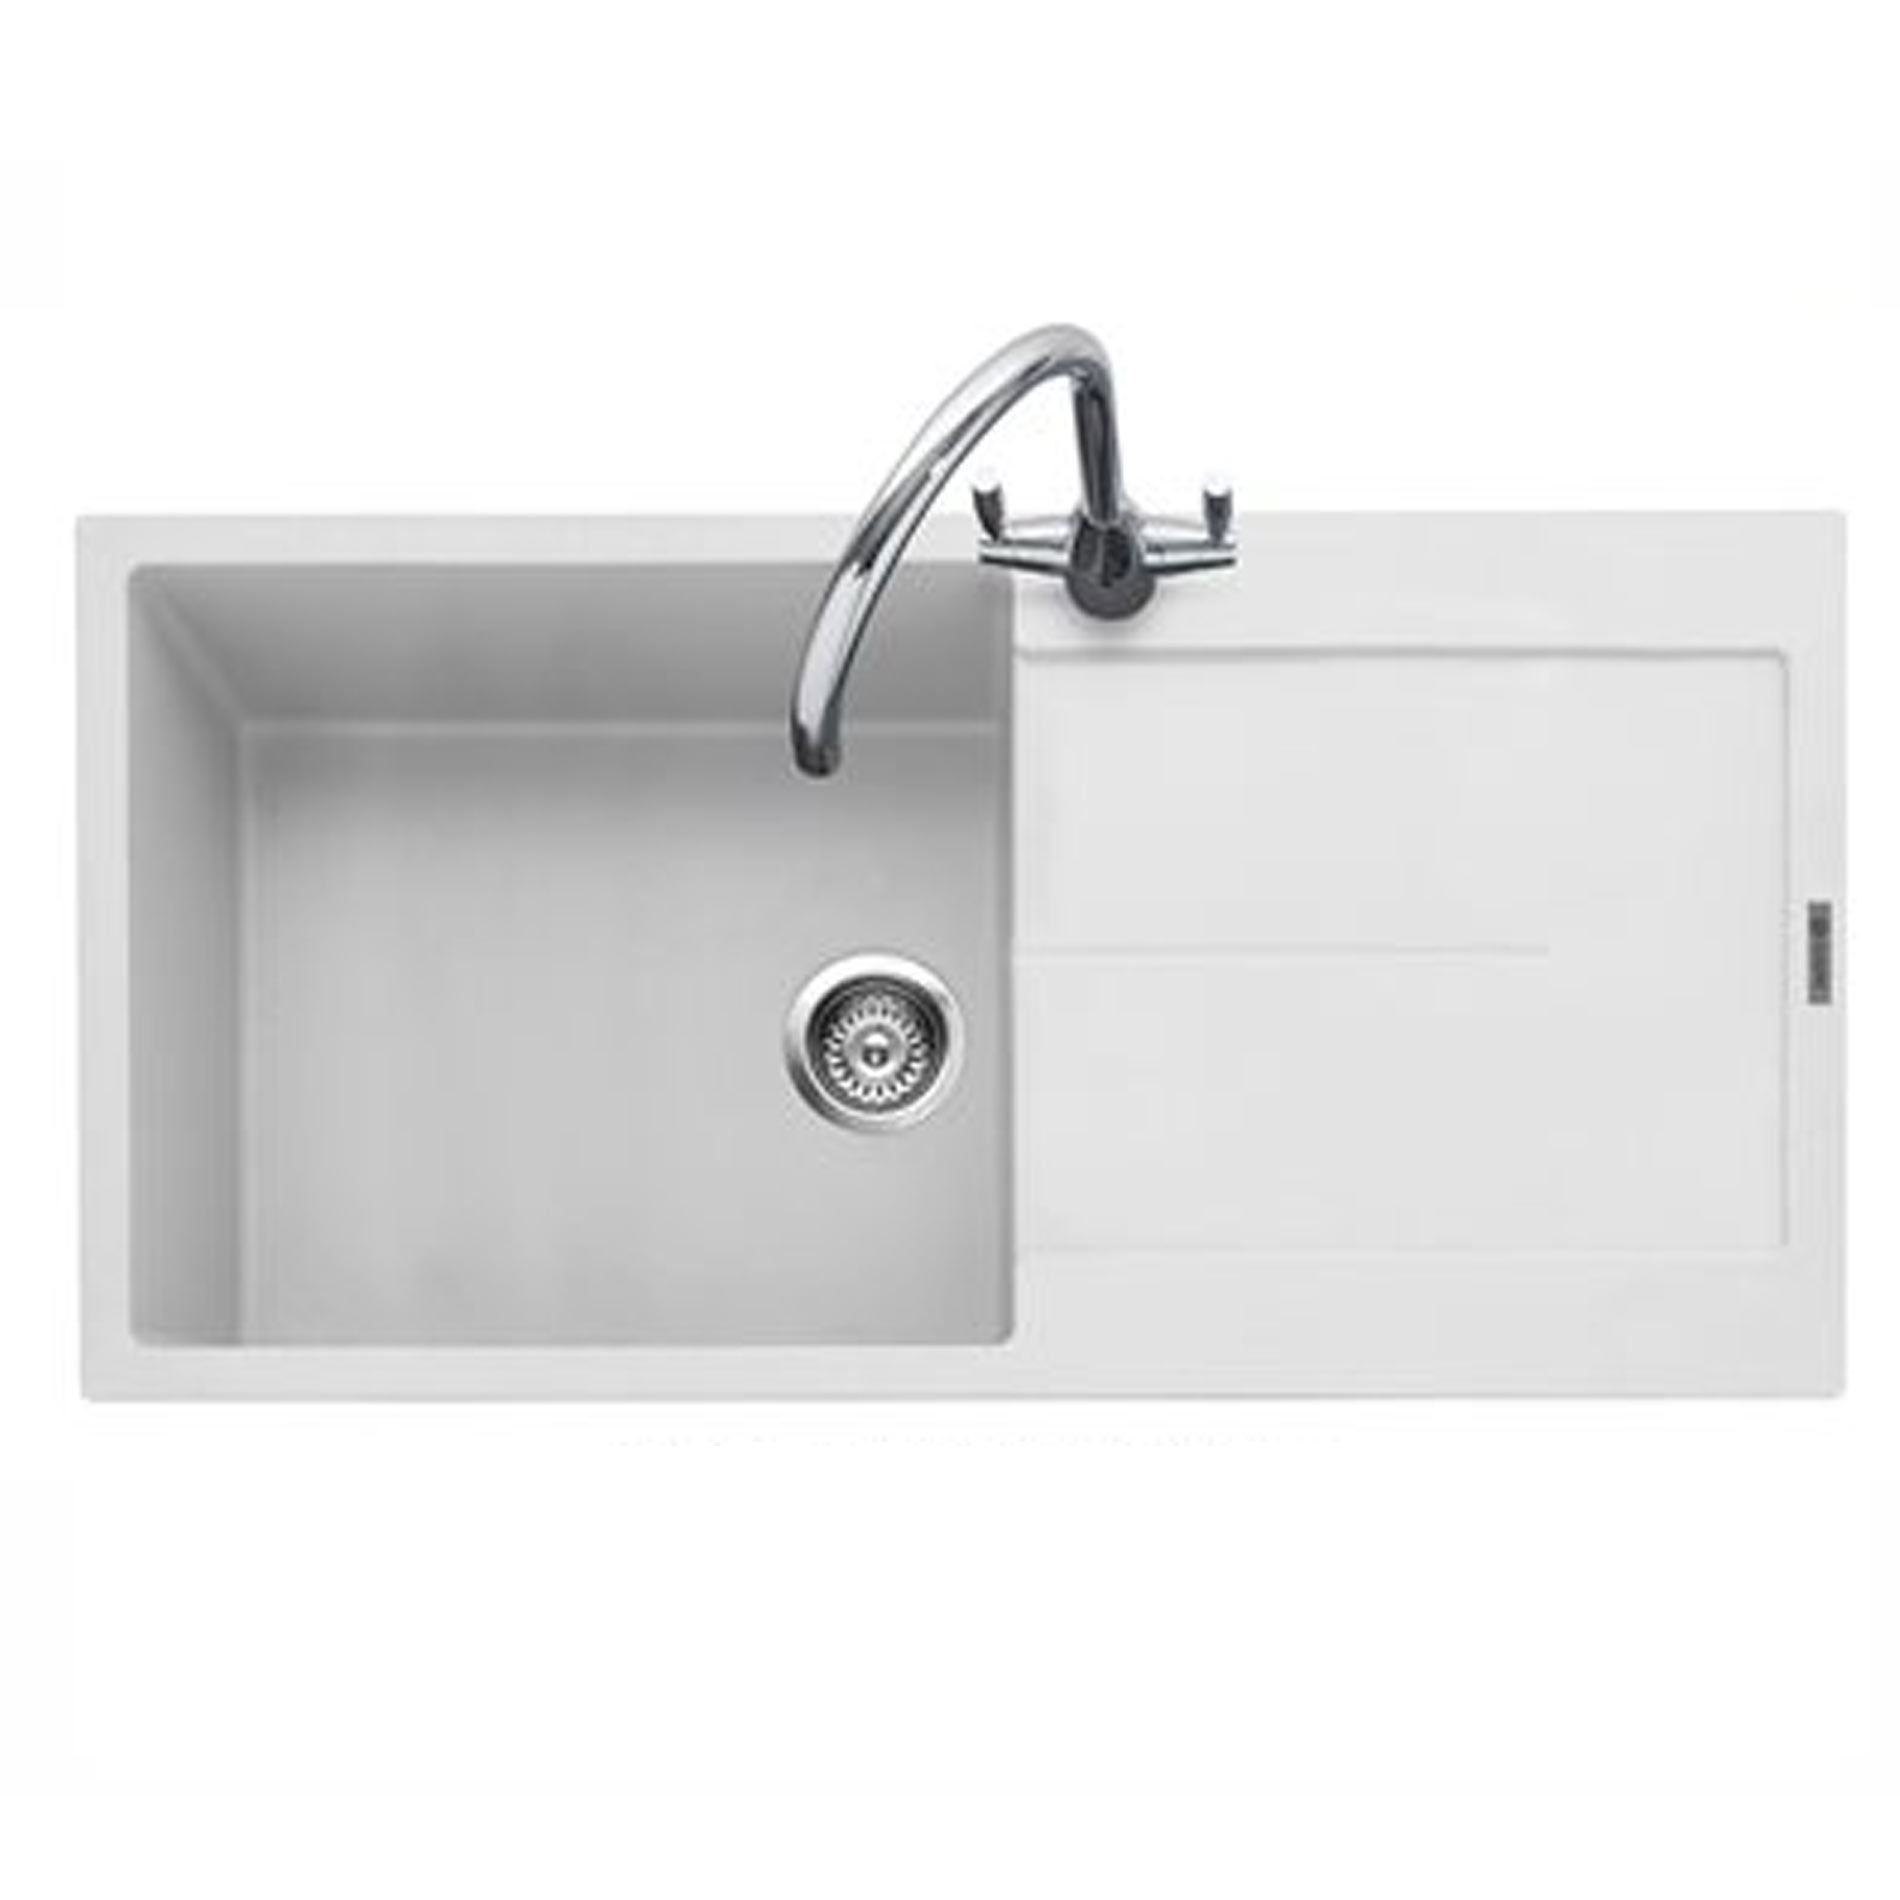 Granite Sink White : Kitchen Sinks & Taps - Caple: Canis 100 Chalk White Granite Sink